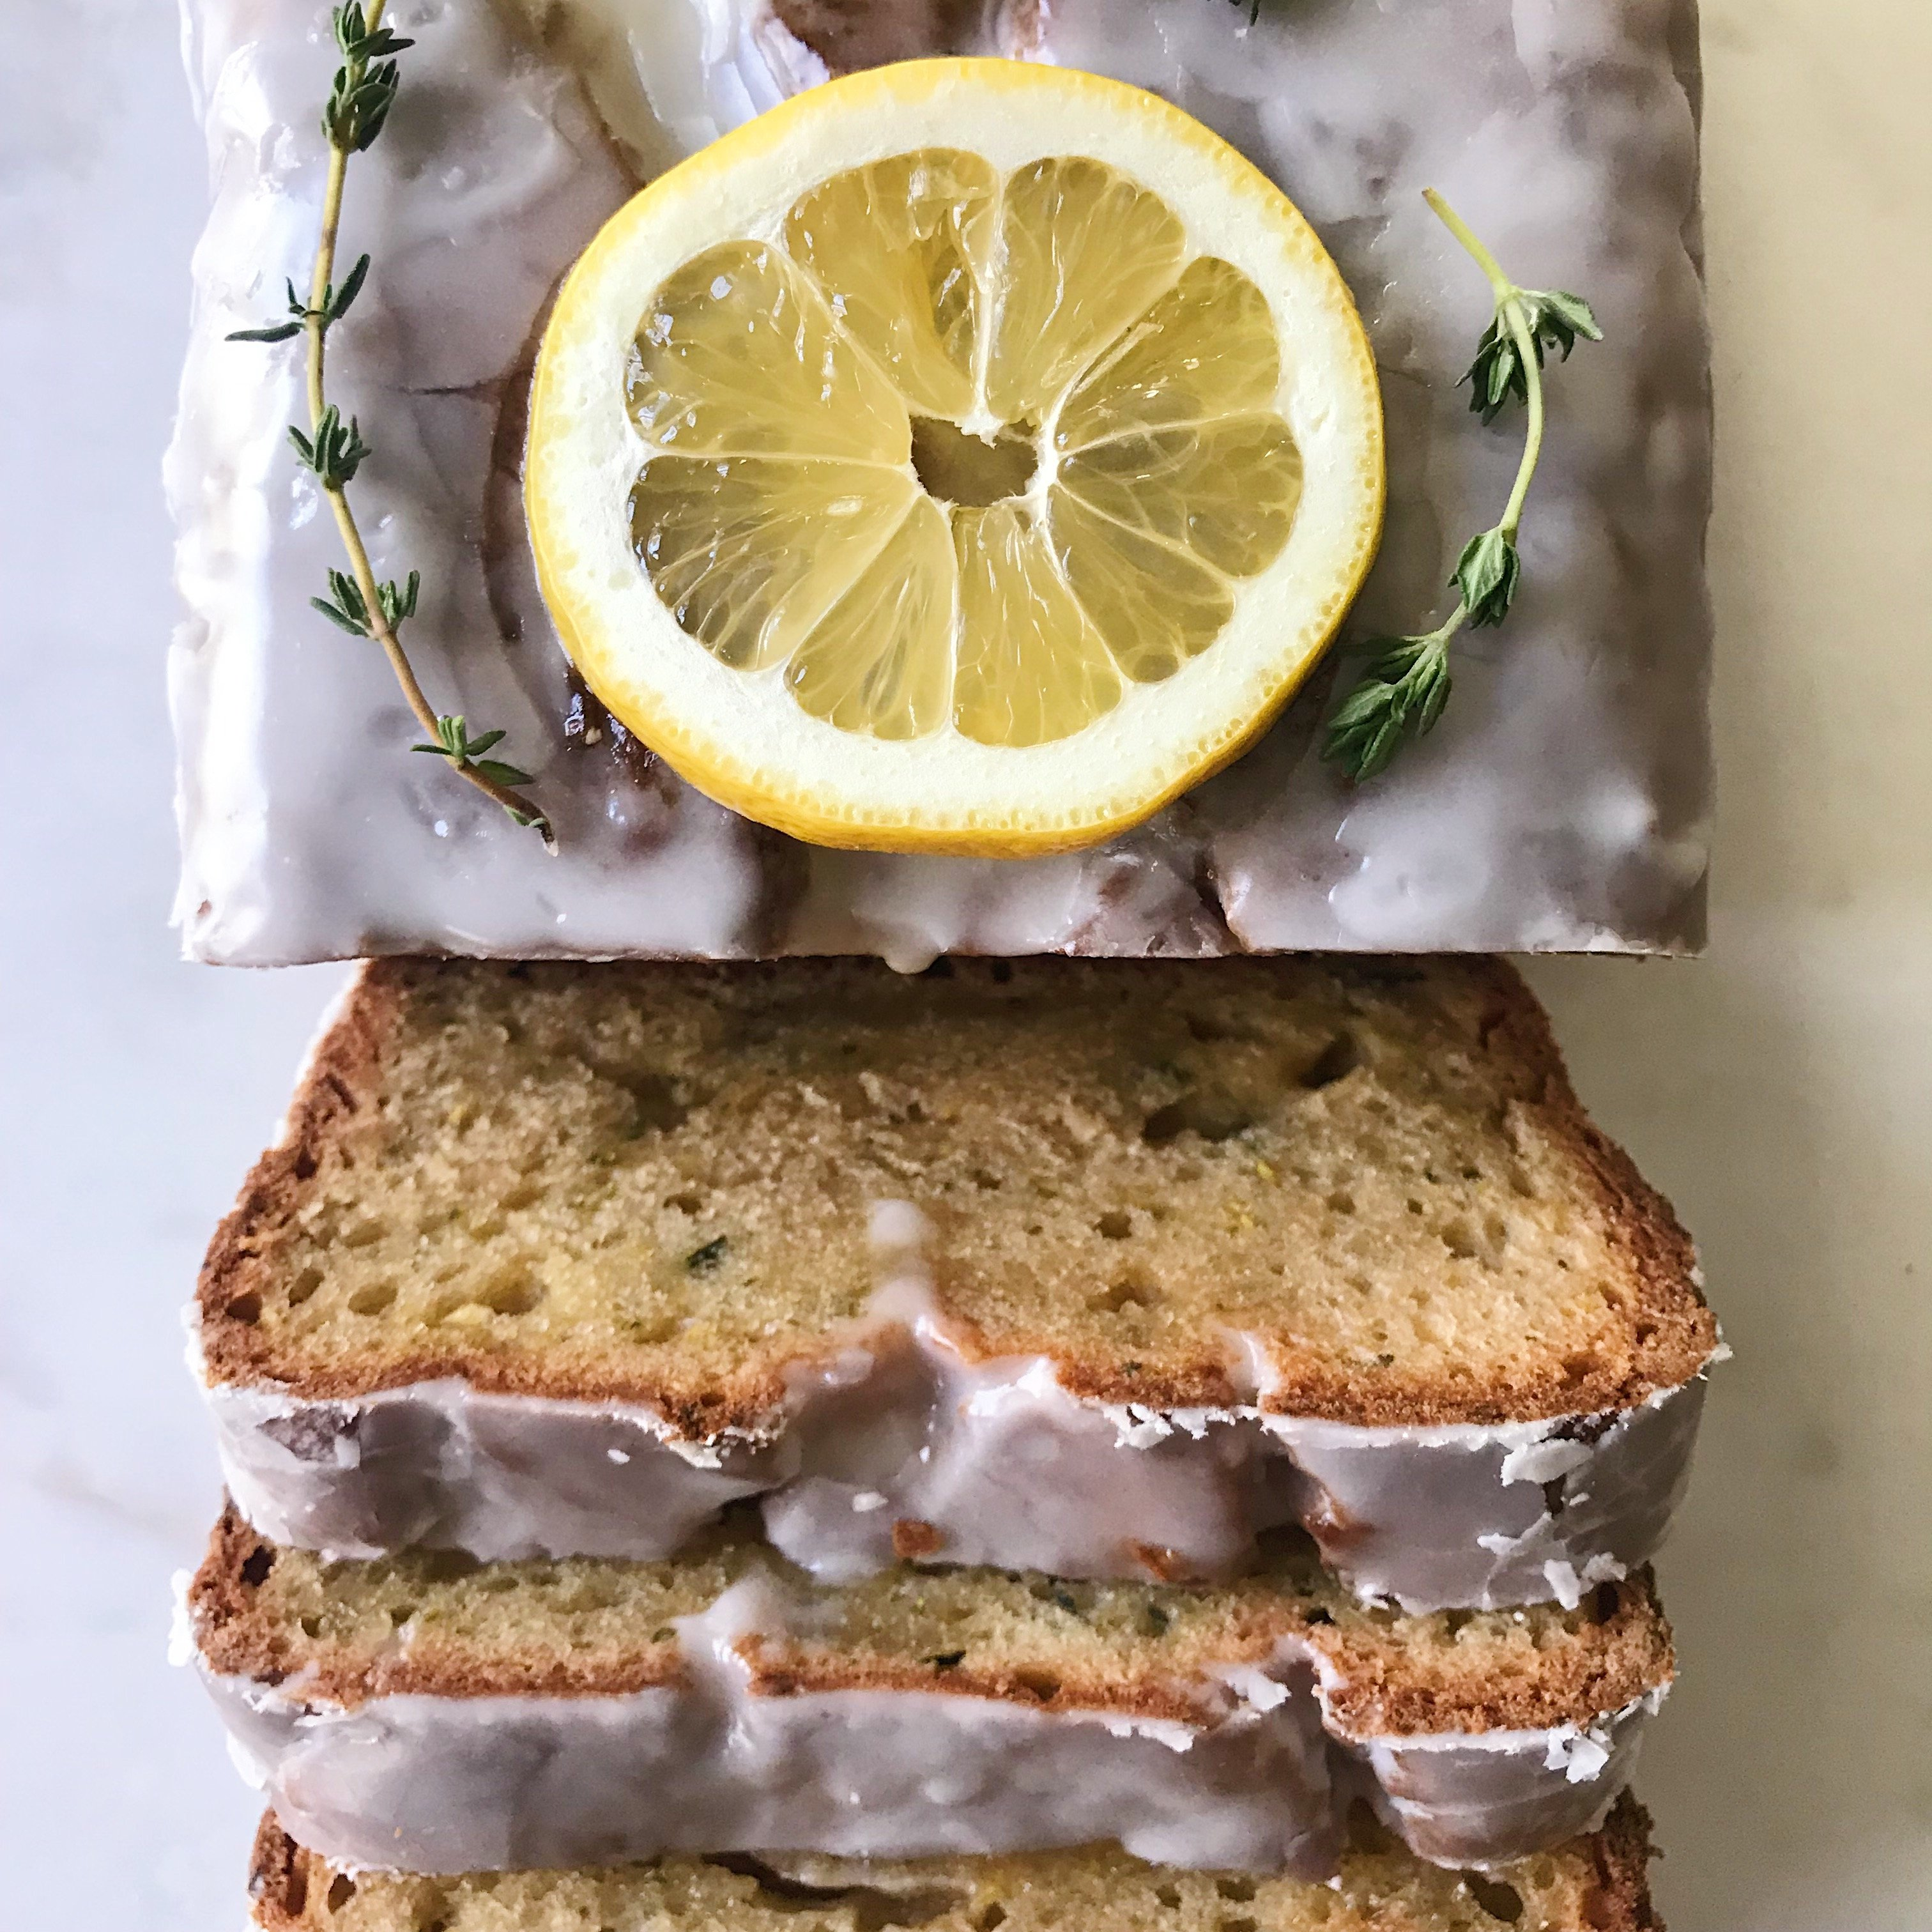 gluten-free lemon zucchini loaf #glutenfree #glutenfreerecipes healthygffamily.com